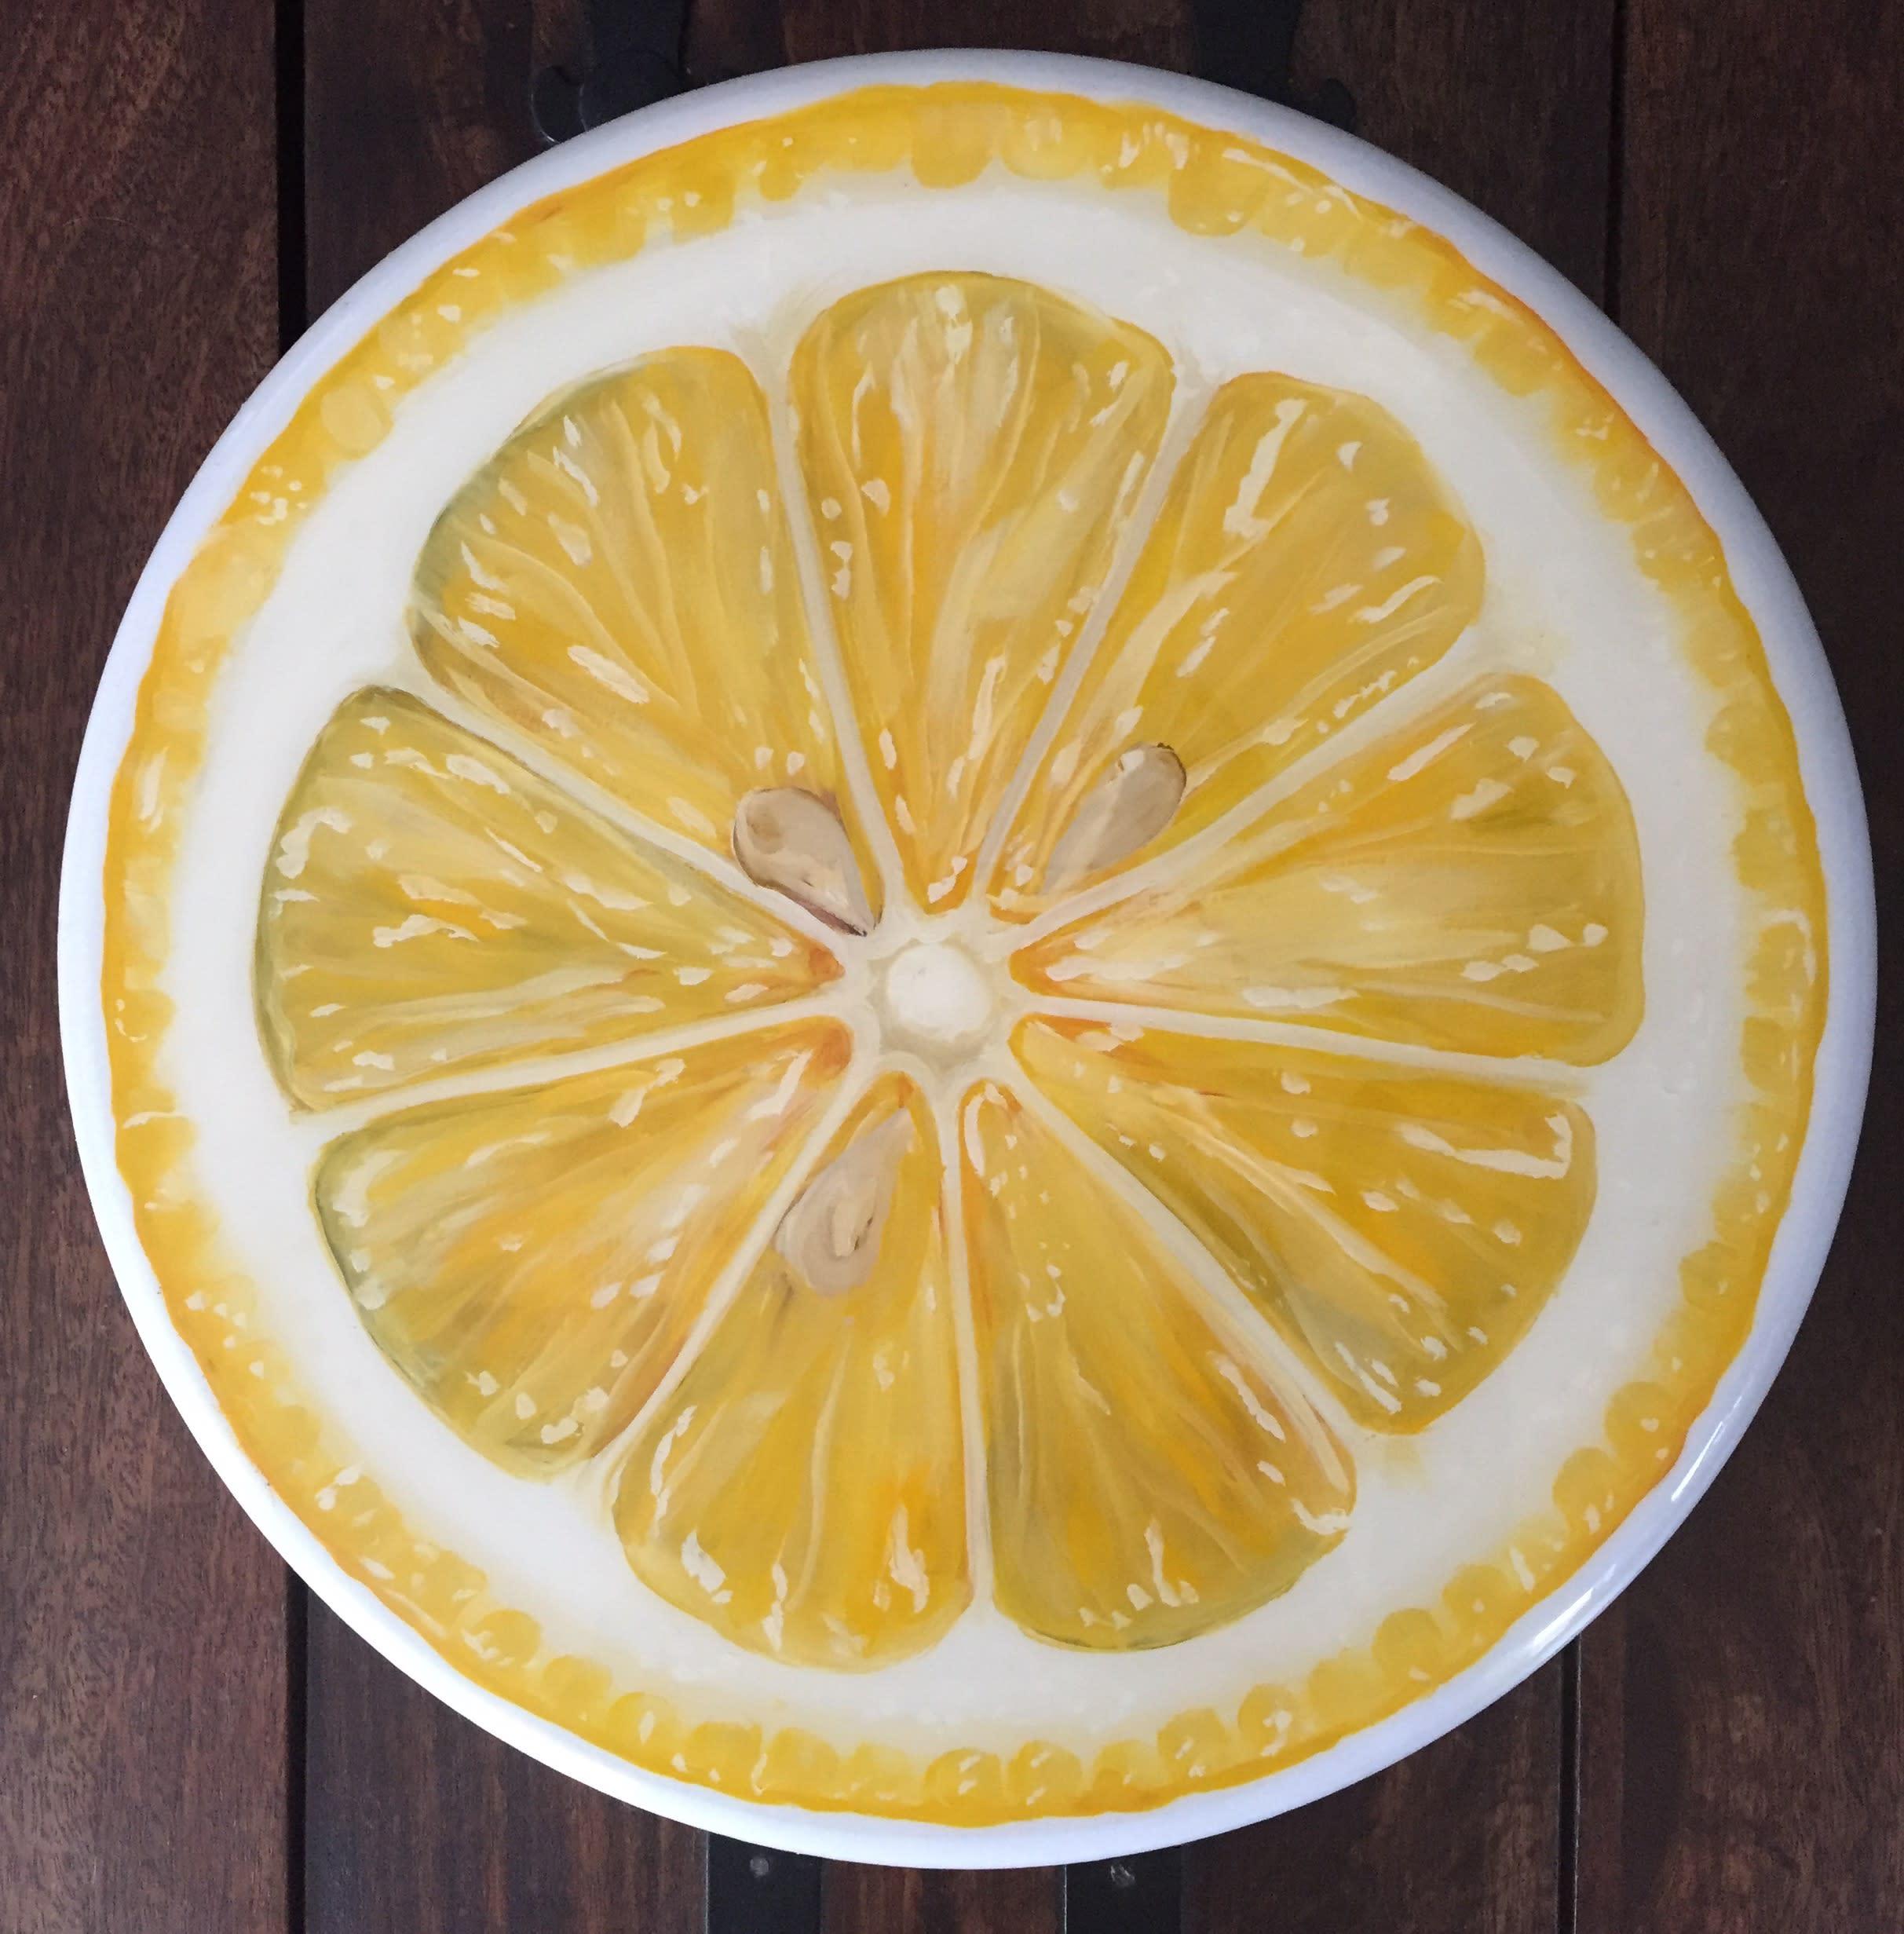 Lazy susan lemon slice 14 itznnz